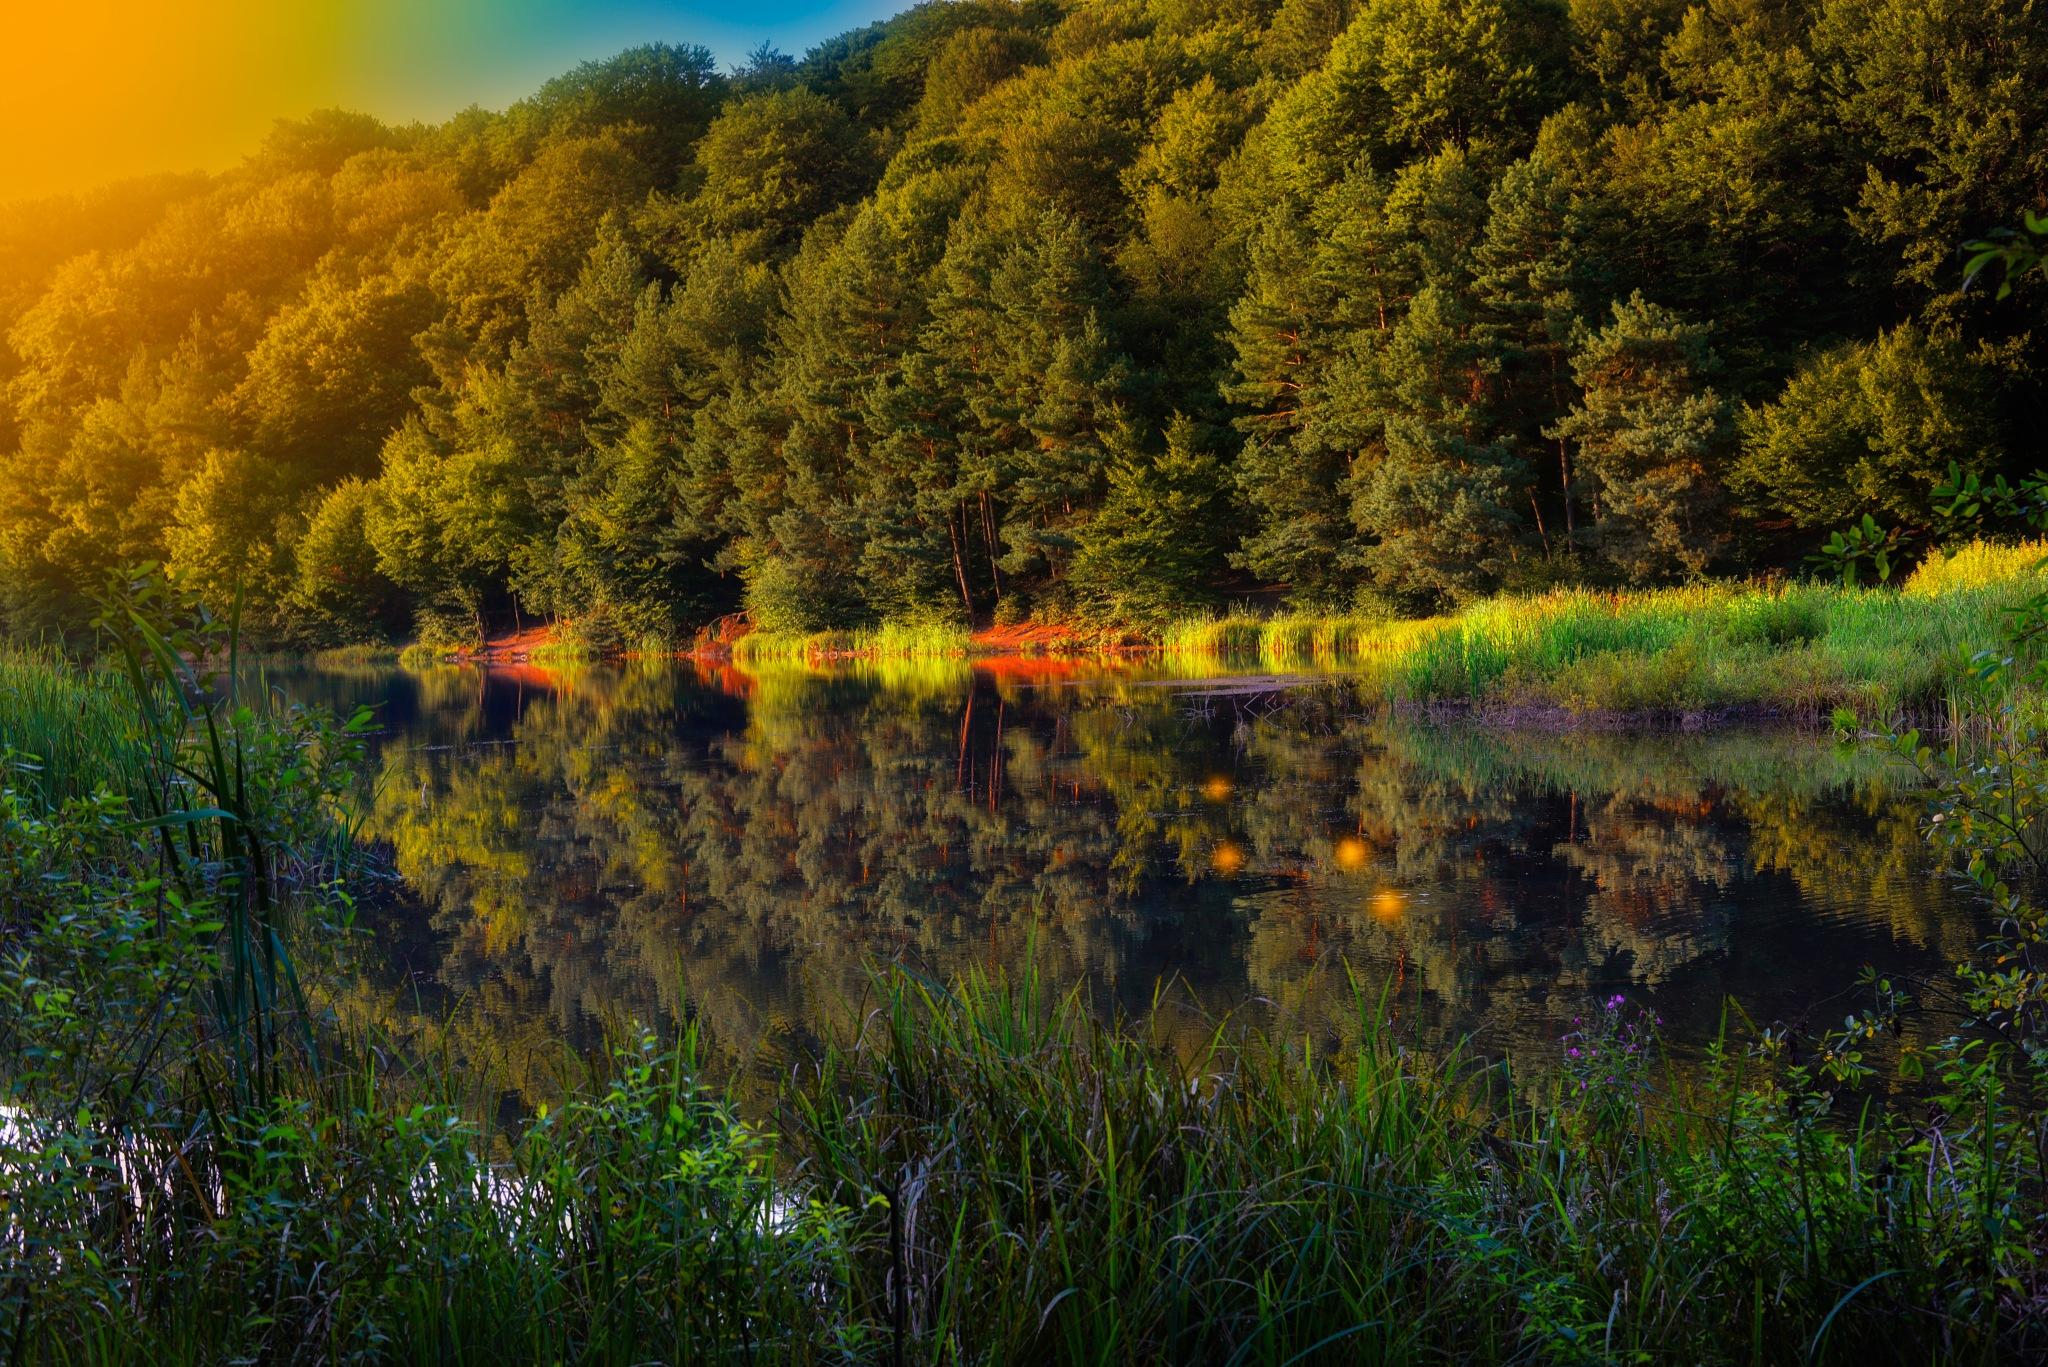 sunset by colisniuc sorin-valerian